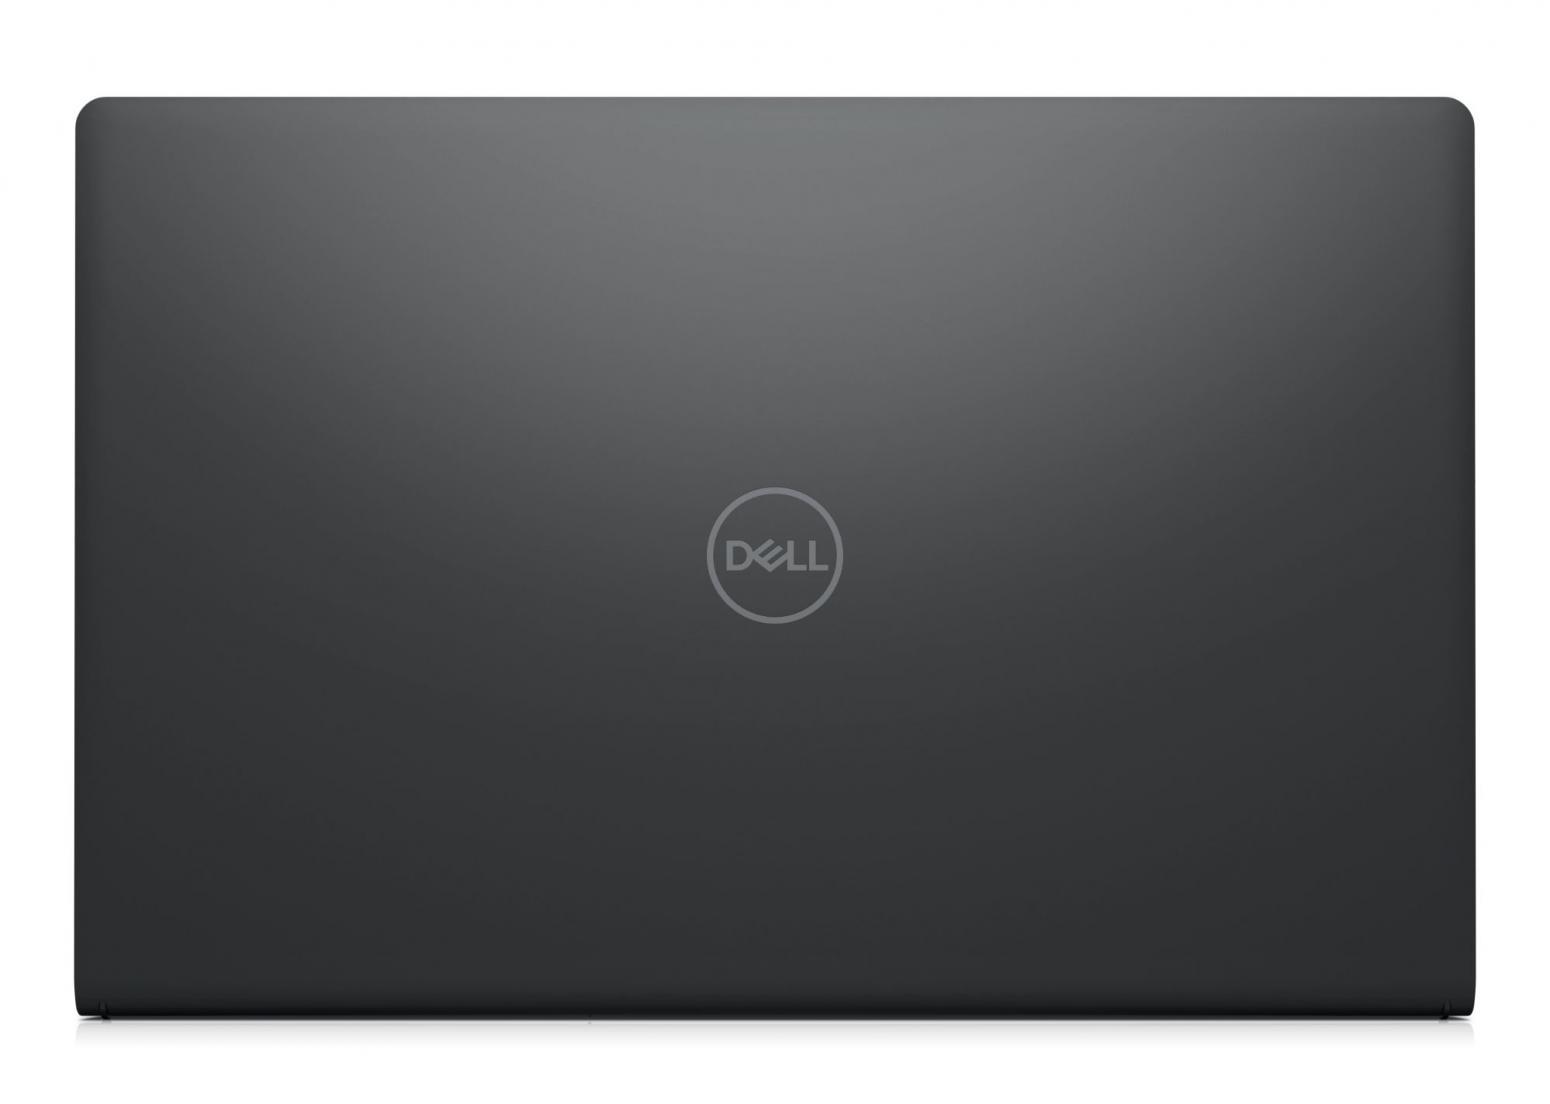 Ordinateur portable Dell Inspiron 15 3511 Noir - i3, Intel G4, SSD 256 Go - photo 6